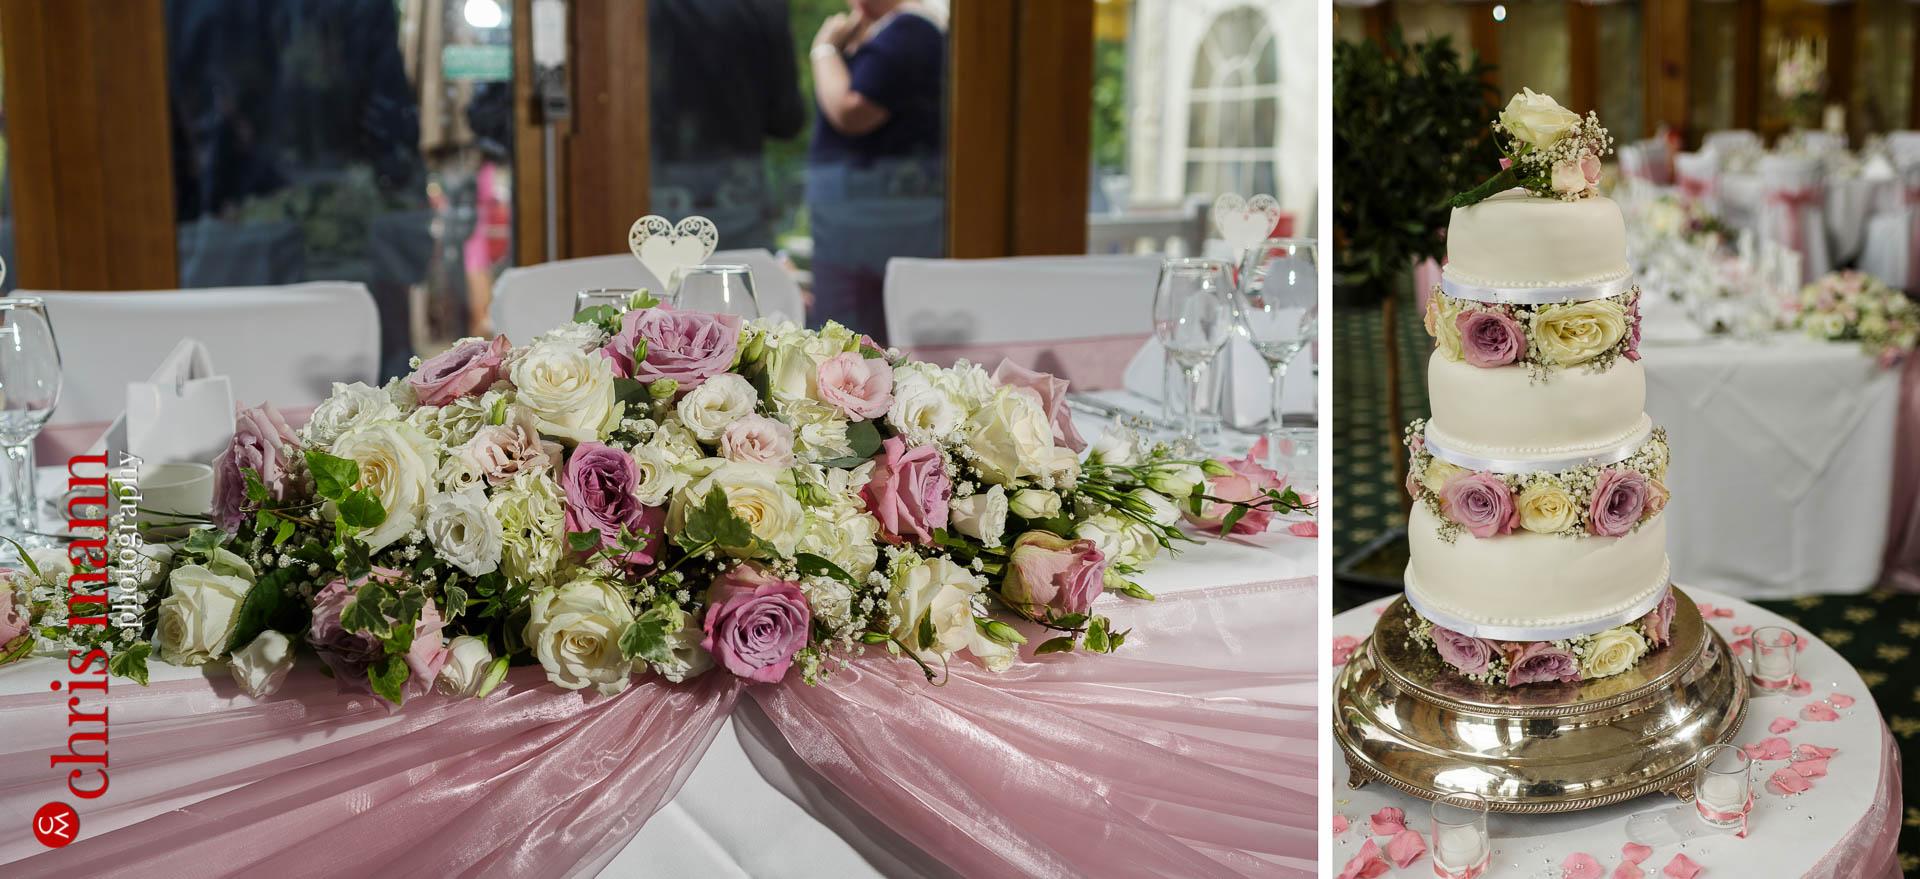 Brocket Hall wedding cake and flowers